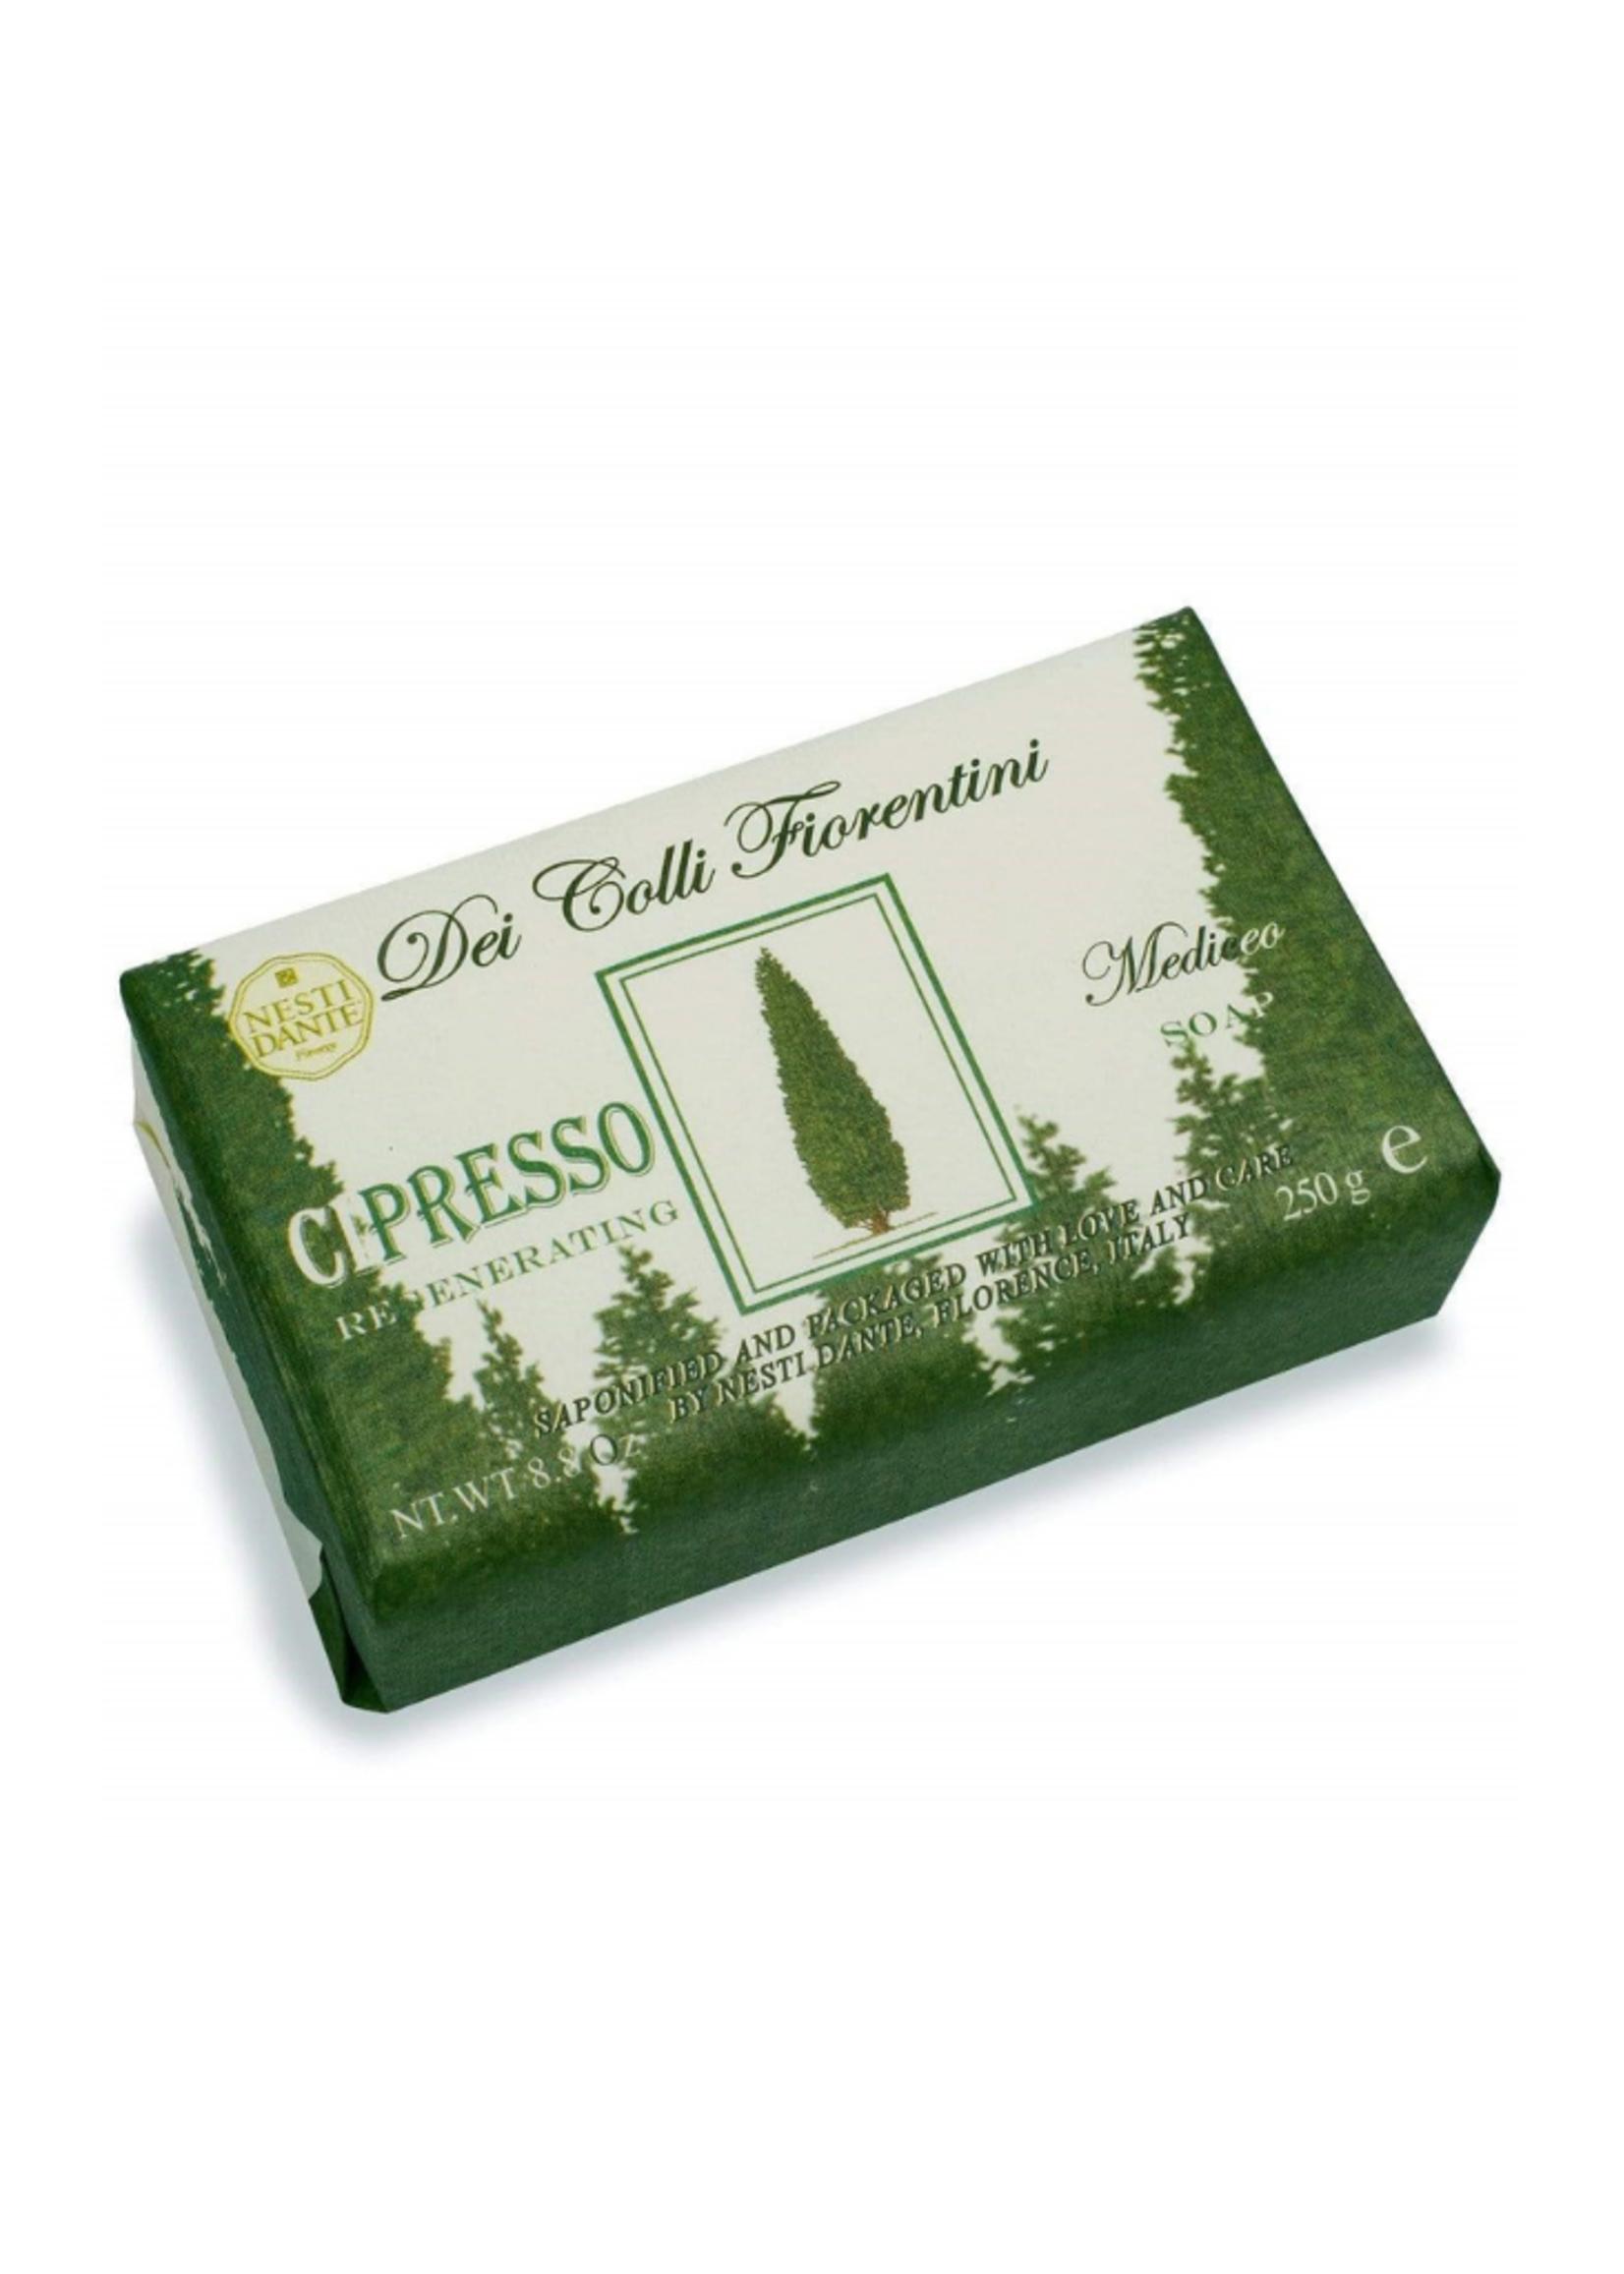 nesti dante Nesti Dante Italian Cypress Soap